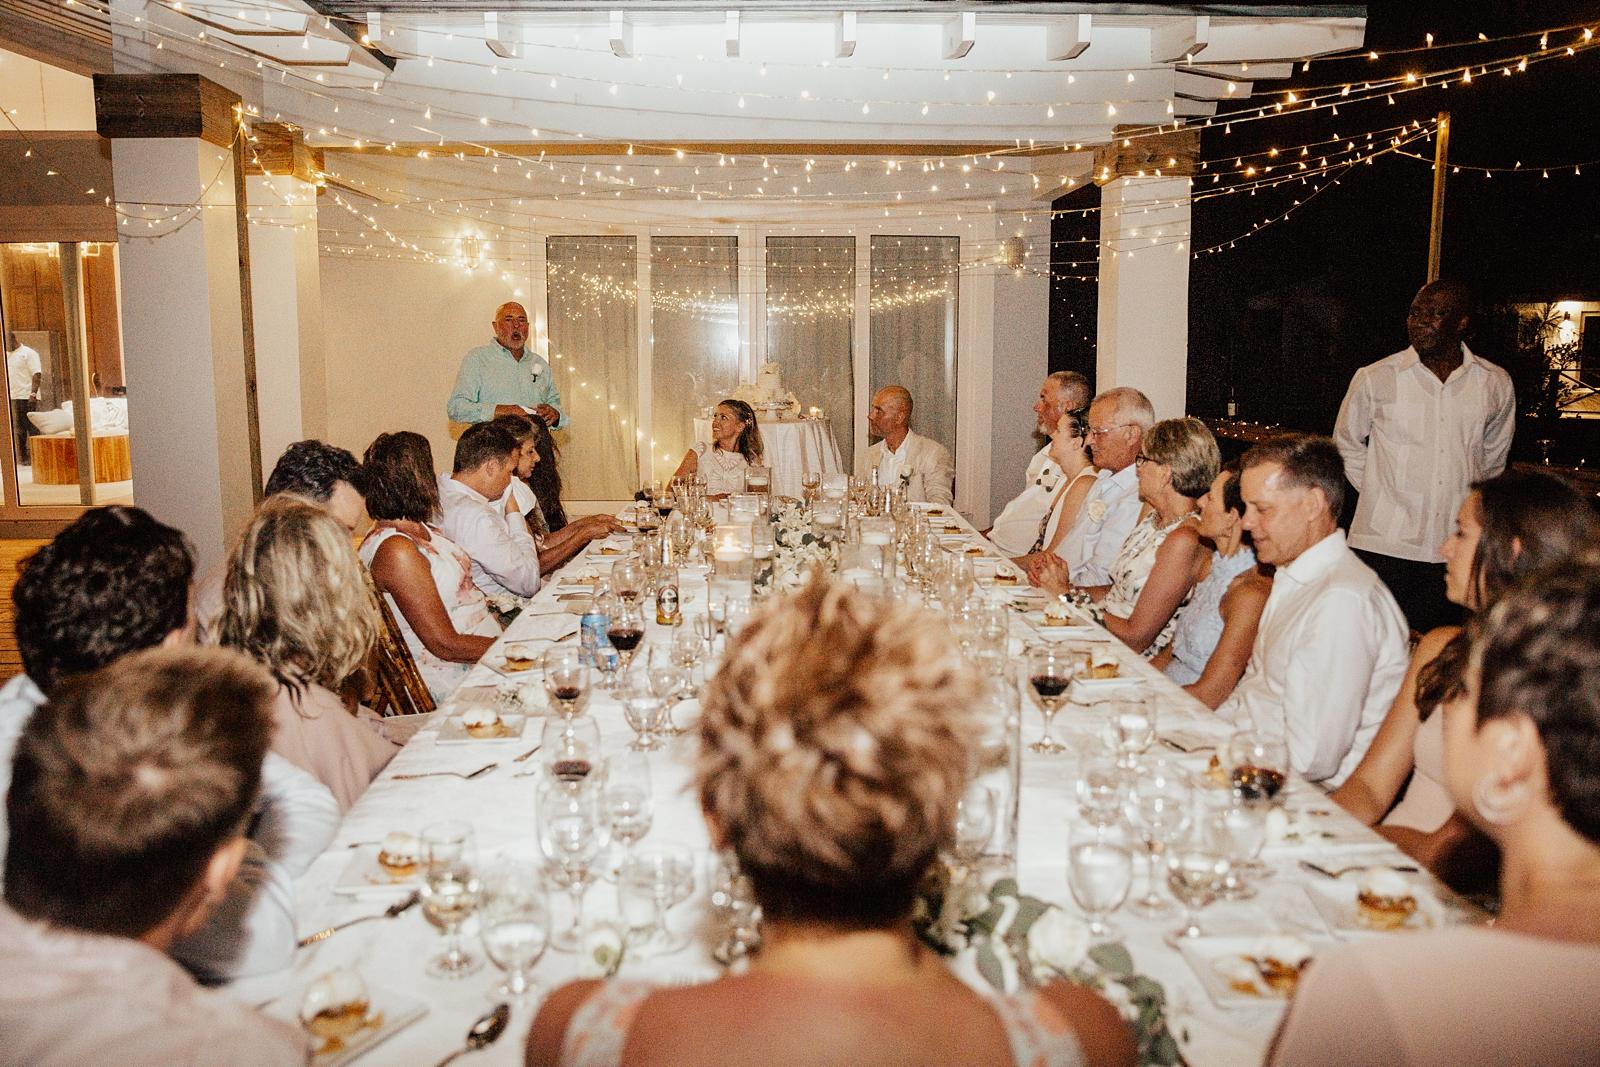 Jenni & Andrew Intimate Beach Destination Wedding in Little Exuma, Bahamas_0537.jpg